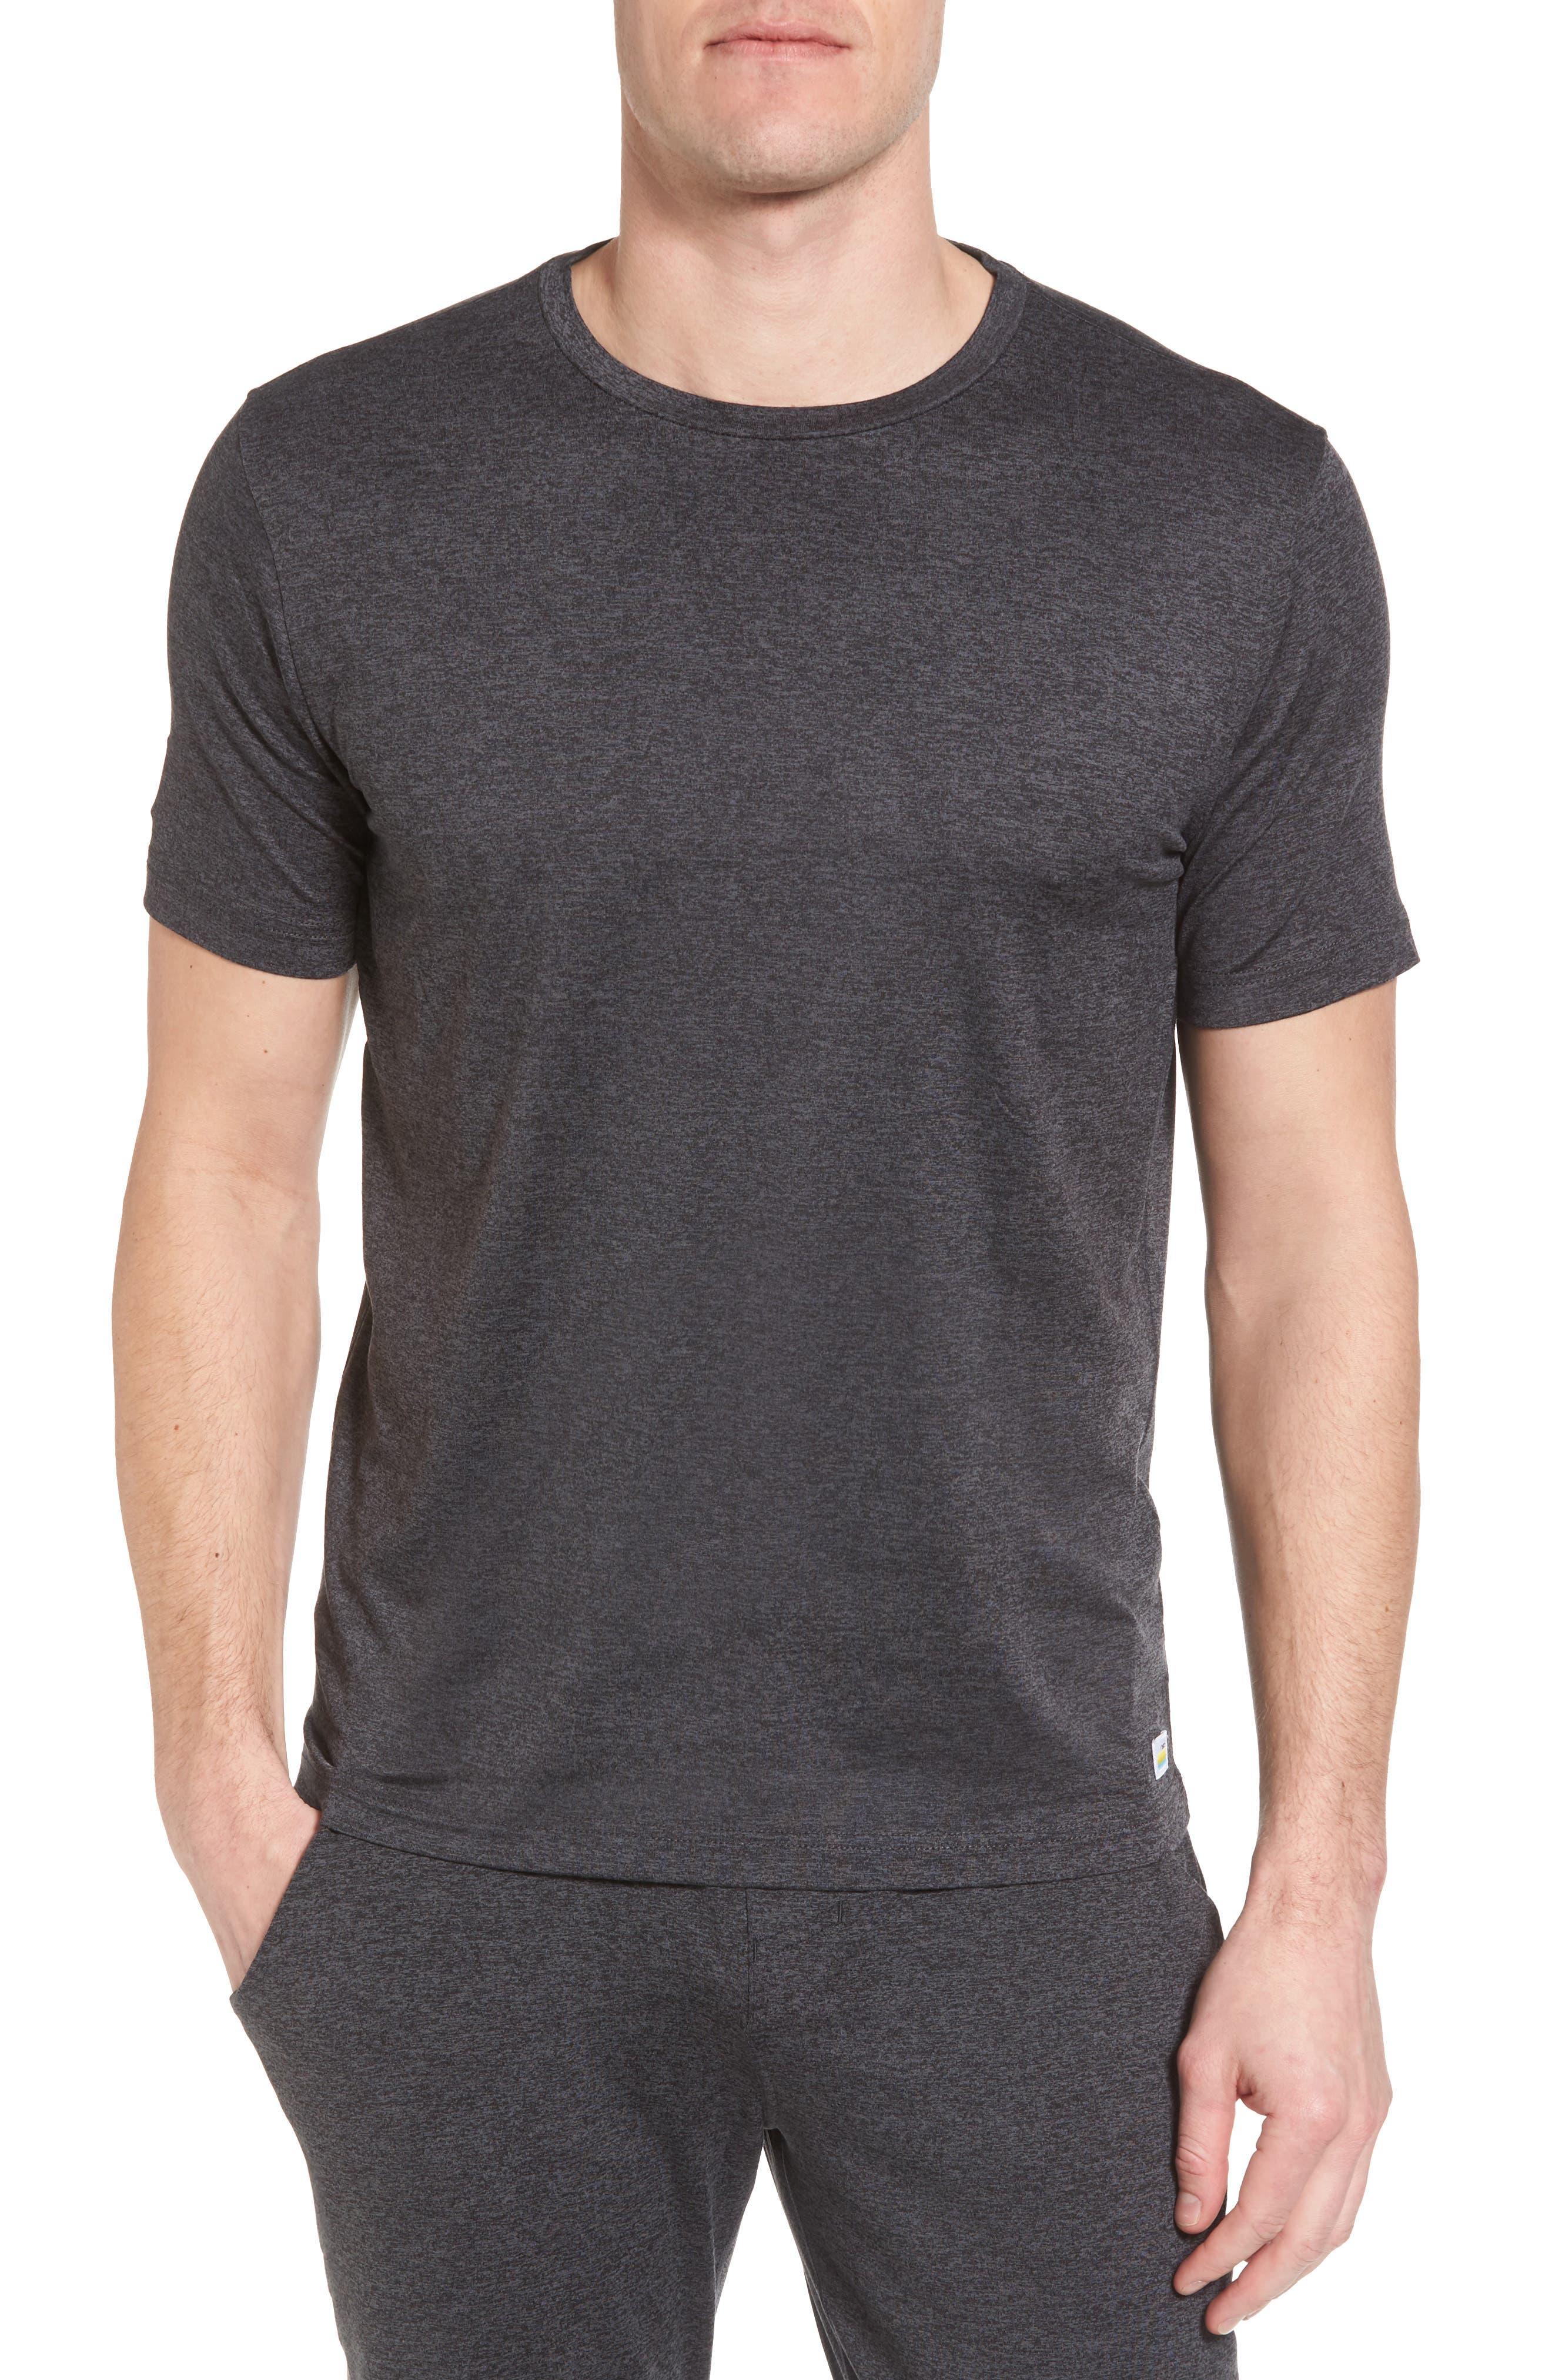 Alternate Image 1 Selected - Vuori Strato Slim Fit Crewneck T-Shirt